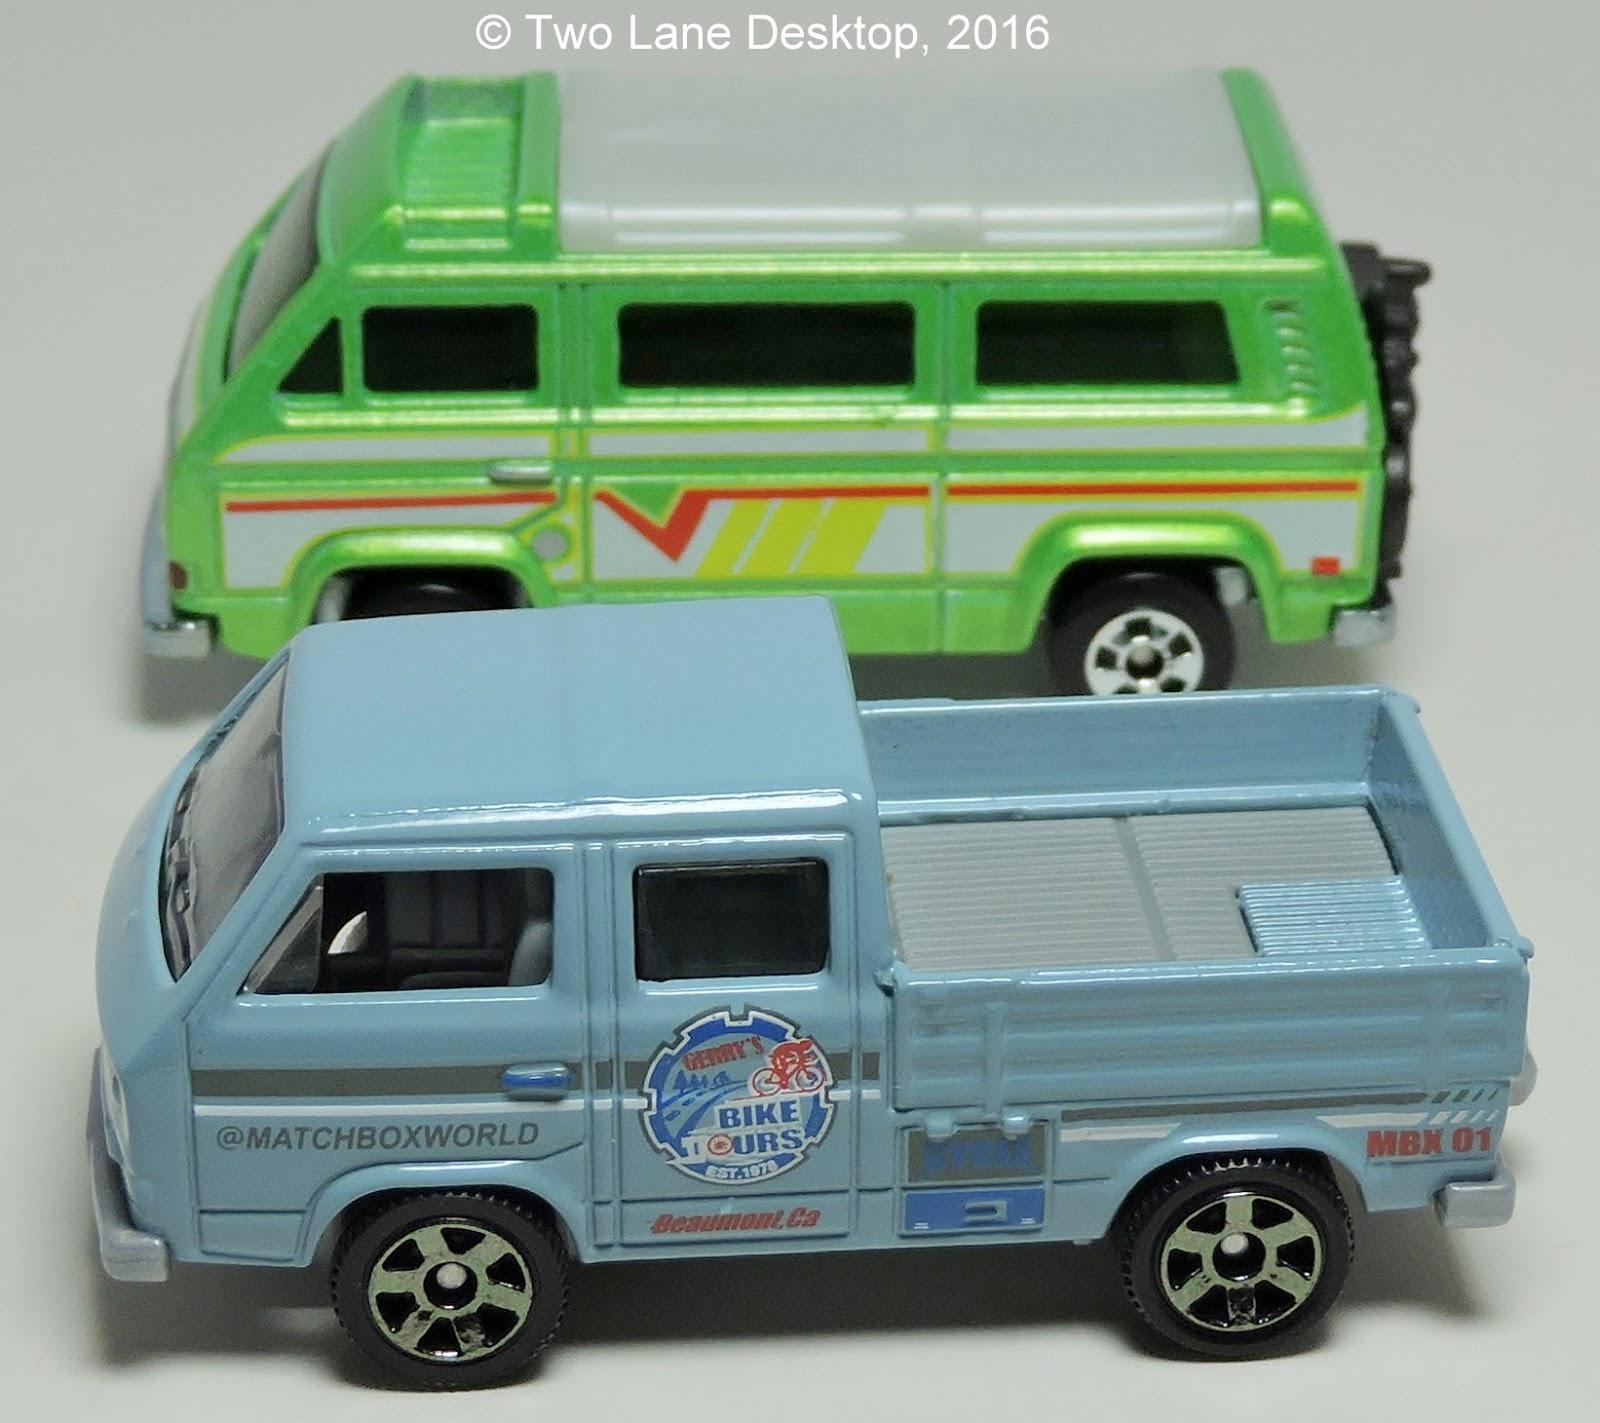 Two Lane Desktop Matchbox Vw Transport Pickup And Hot